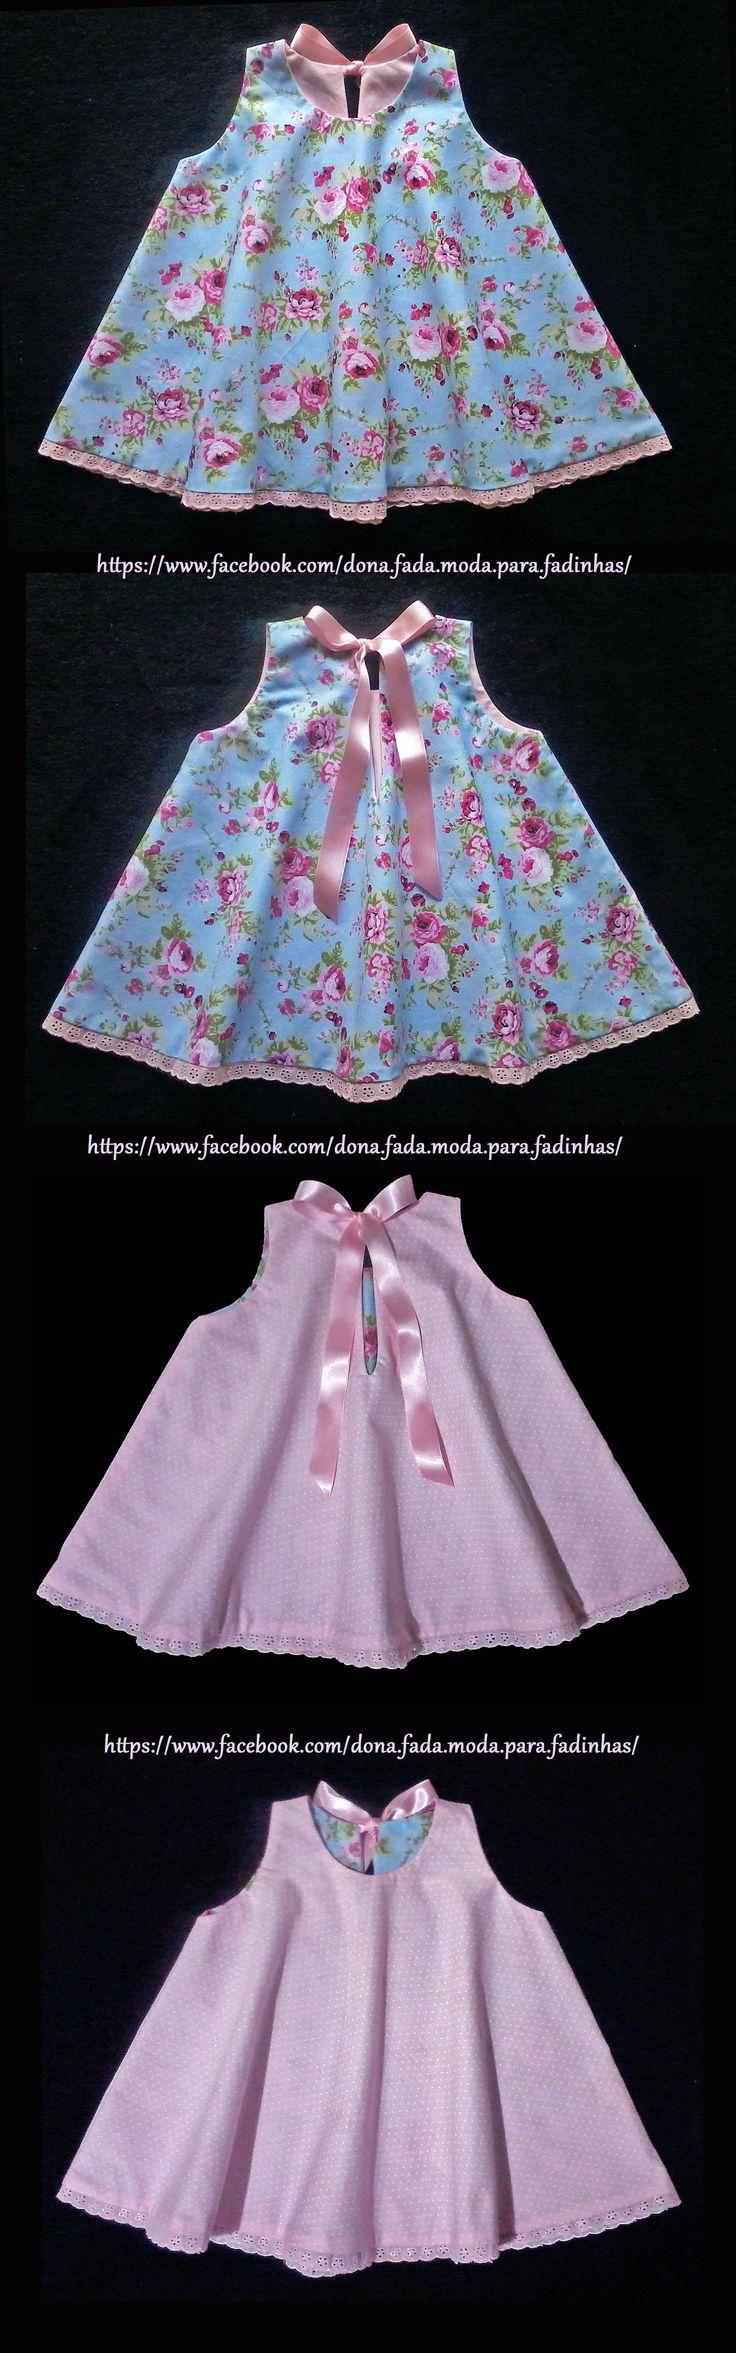 Trapézio Dupla Face 1 ano - Reversible A Line Dress - 1 years- - baby - infant - toddler - kids - clothes for girls - - - https://www.facebook.com/dona.fada.moda.para.fadinhas/